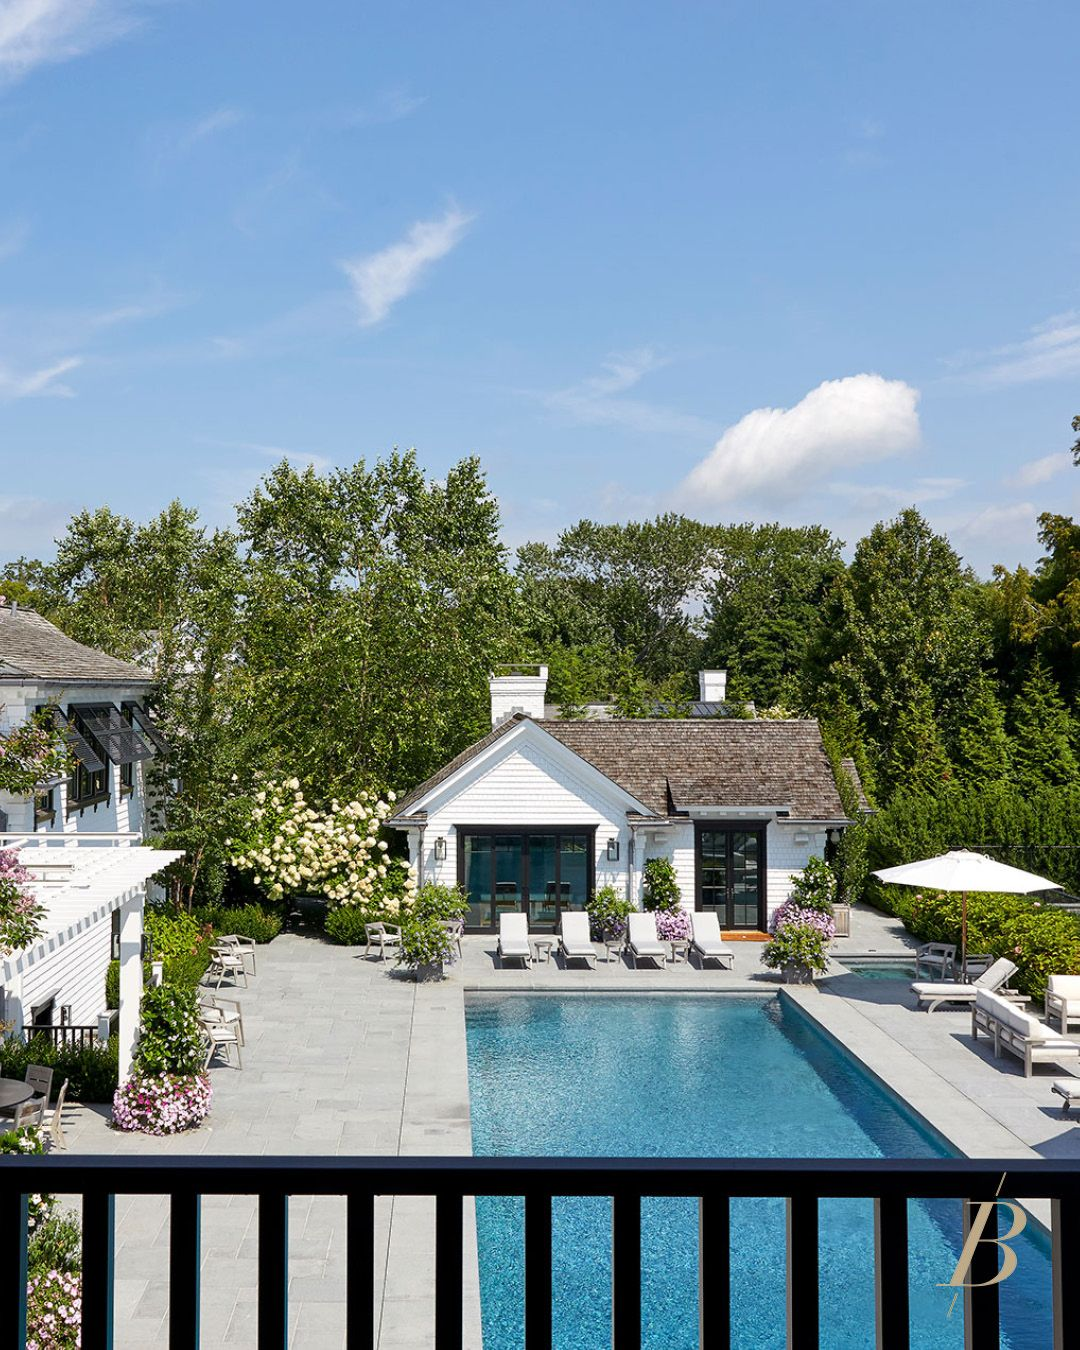 Hamptons Real Estate Showcase: 291 Great Plains Road, Southampton NY - Hamptons Real Estate (With Images)